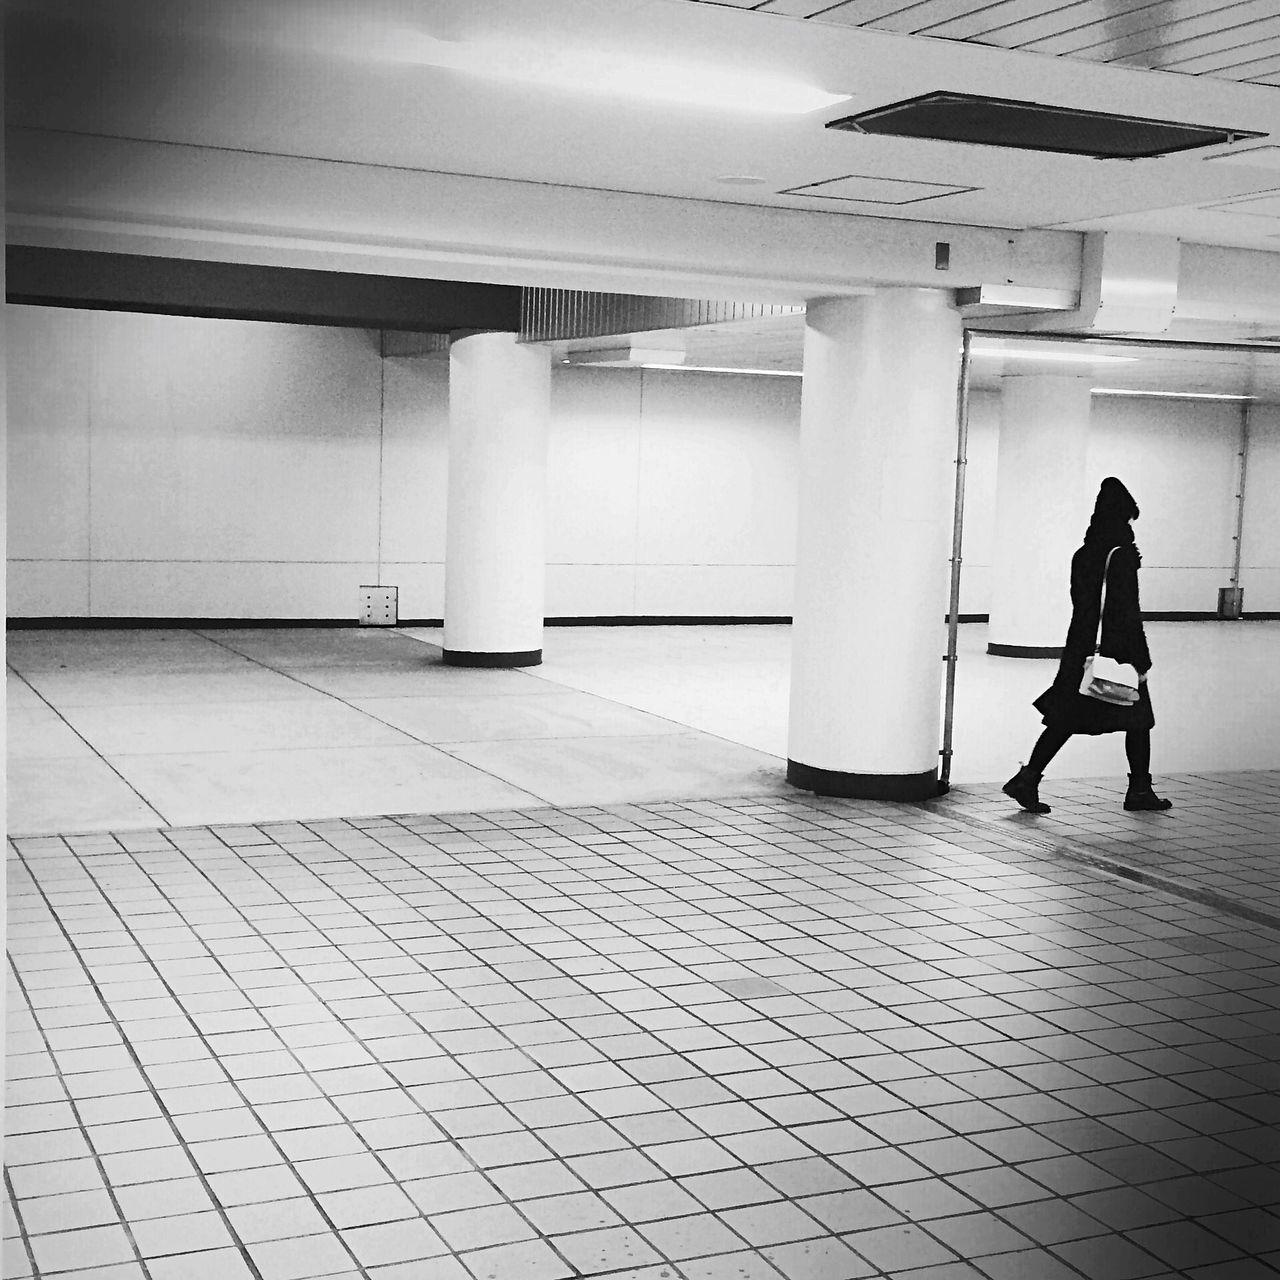 Silhouette Woman Walking In Subway